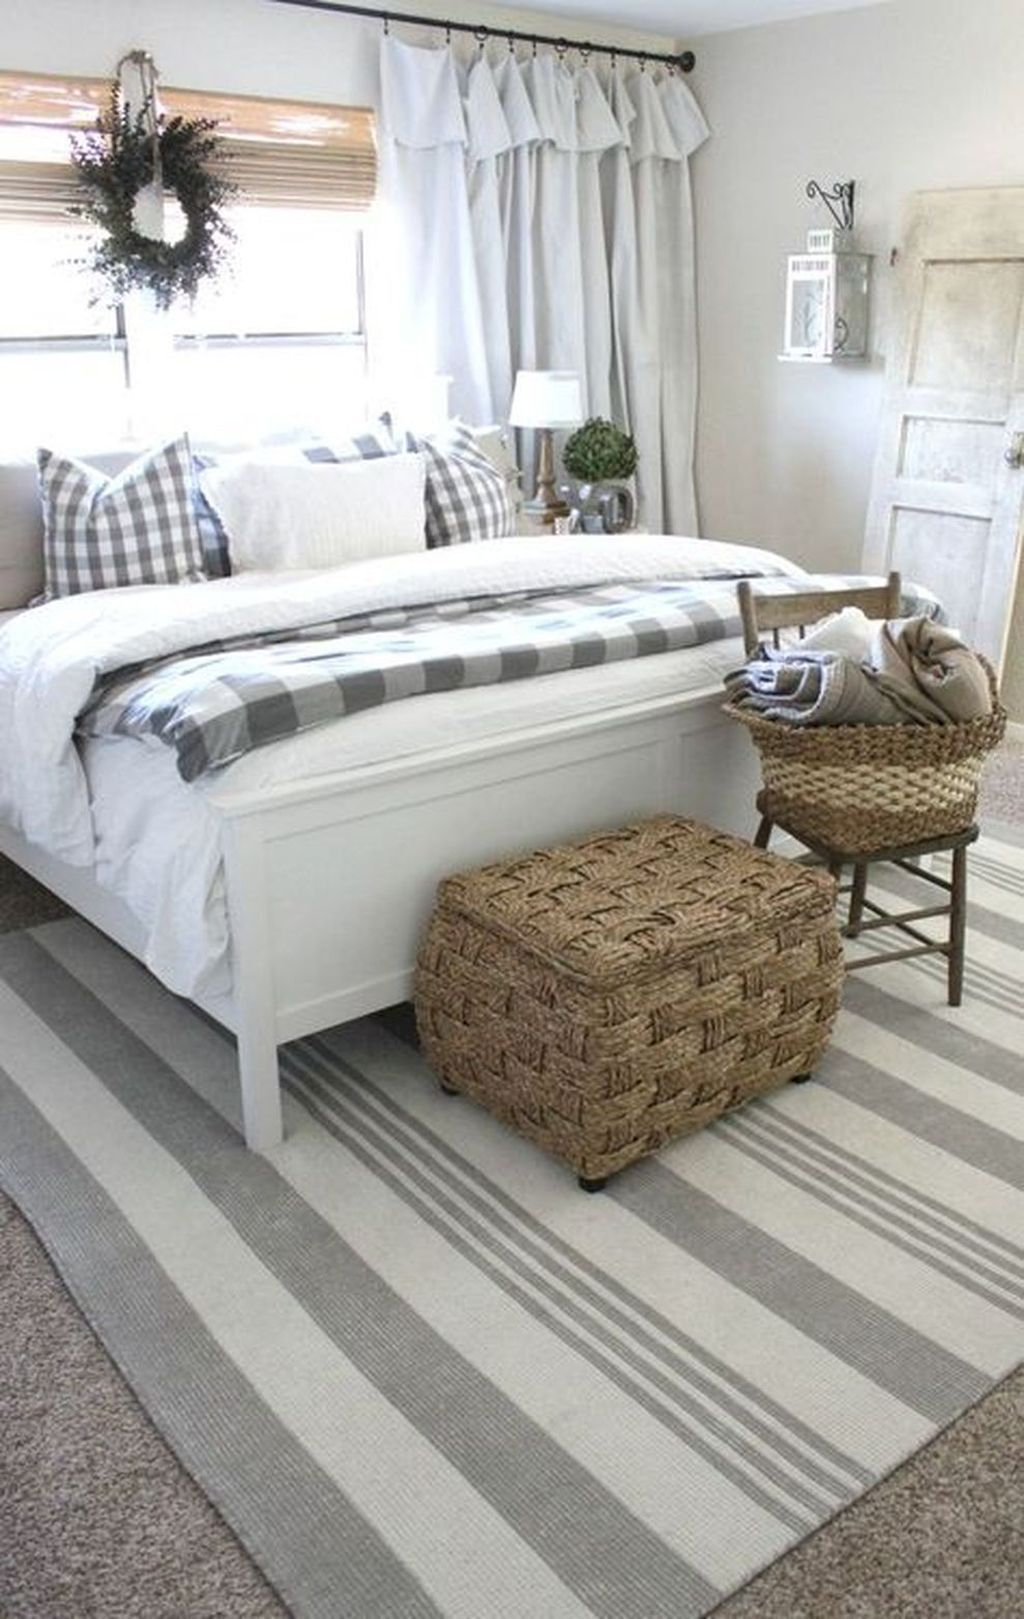 Bedroom Farmhouse Ideas Master Remodel Rustic Style 95 Rustic Master En 2020 Mobilier De Chambre A Coucher Meuble Chambre A Coucher Chambre A Coucher Principale